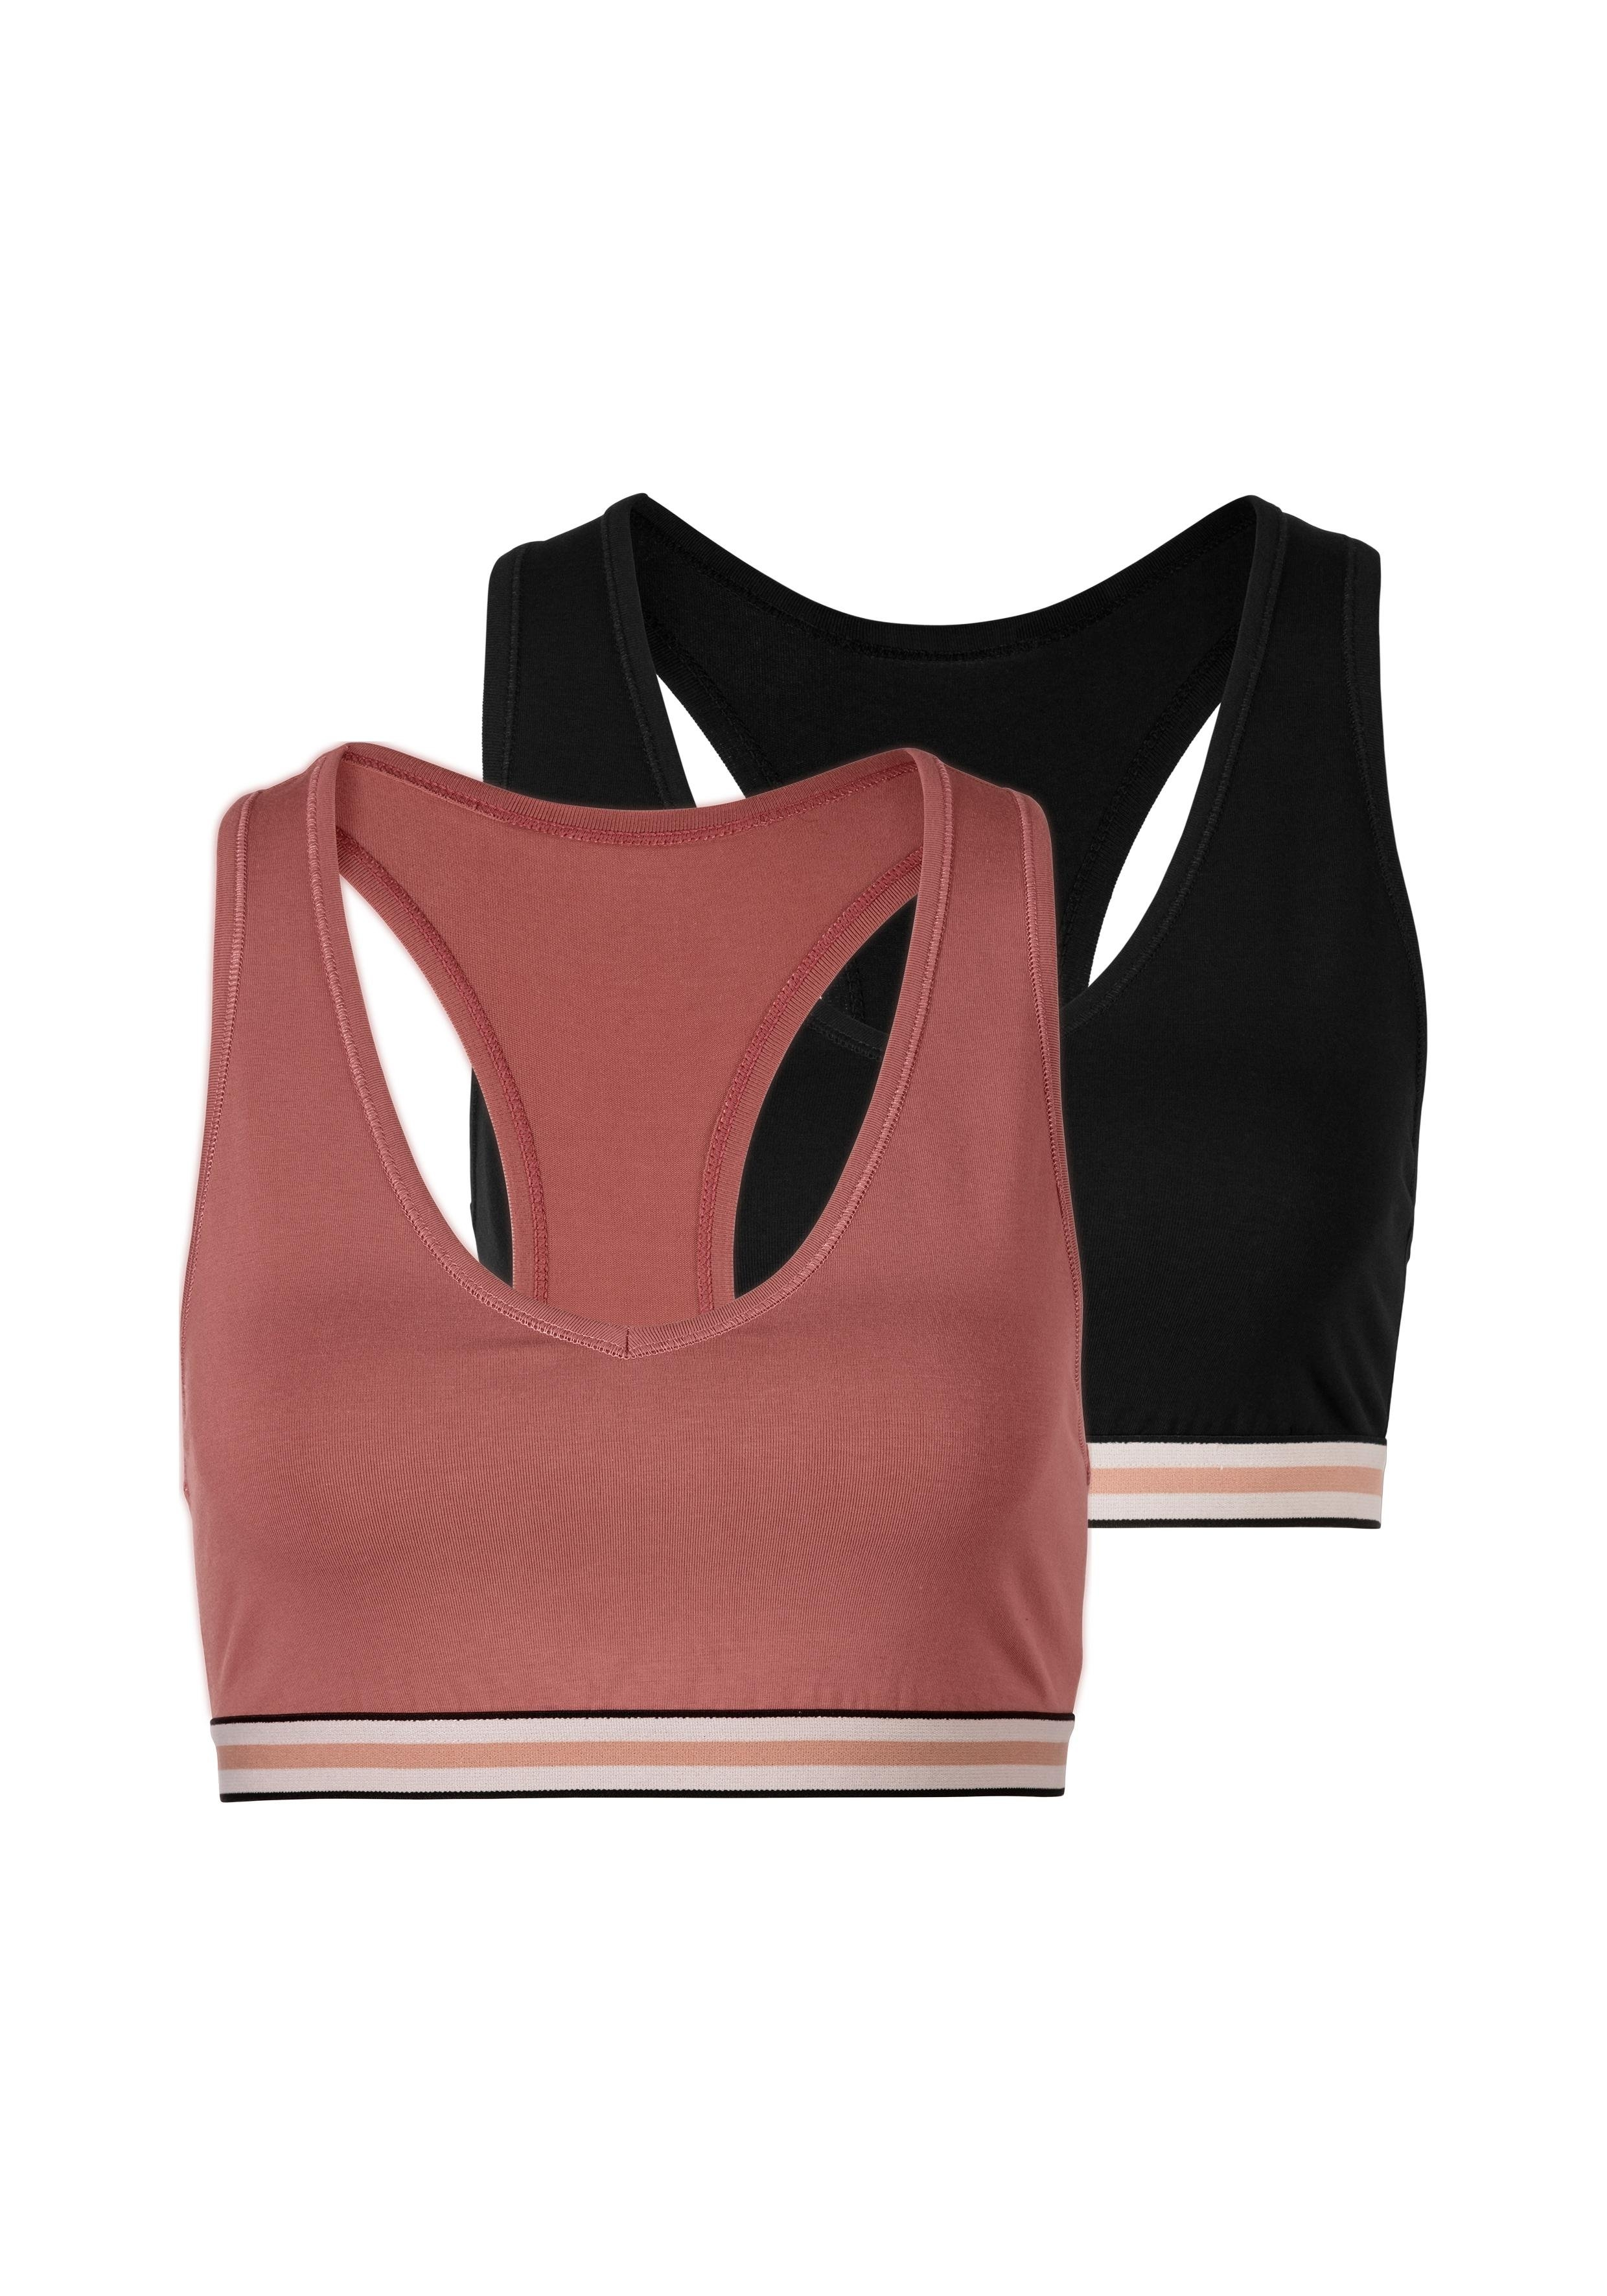 S.oliver Bodywear s.Oliver RED LABEL Bodywear meisjesbustier (set van 3) in ton-sur-tonkleuren nu online bestellen